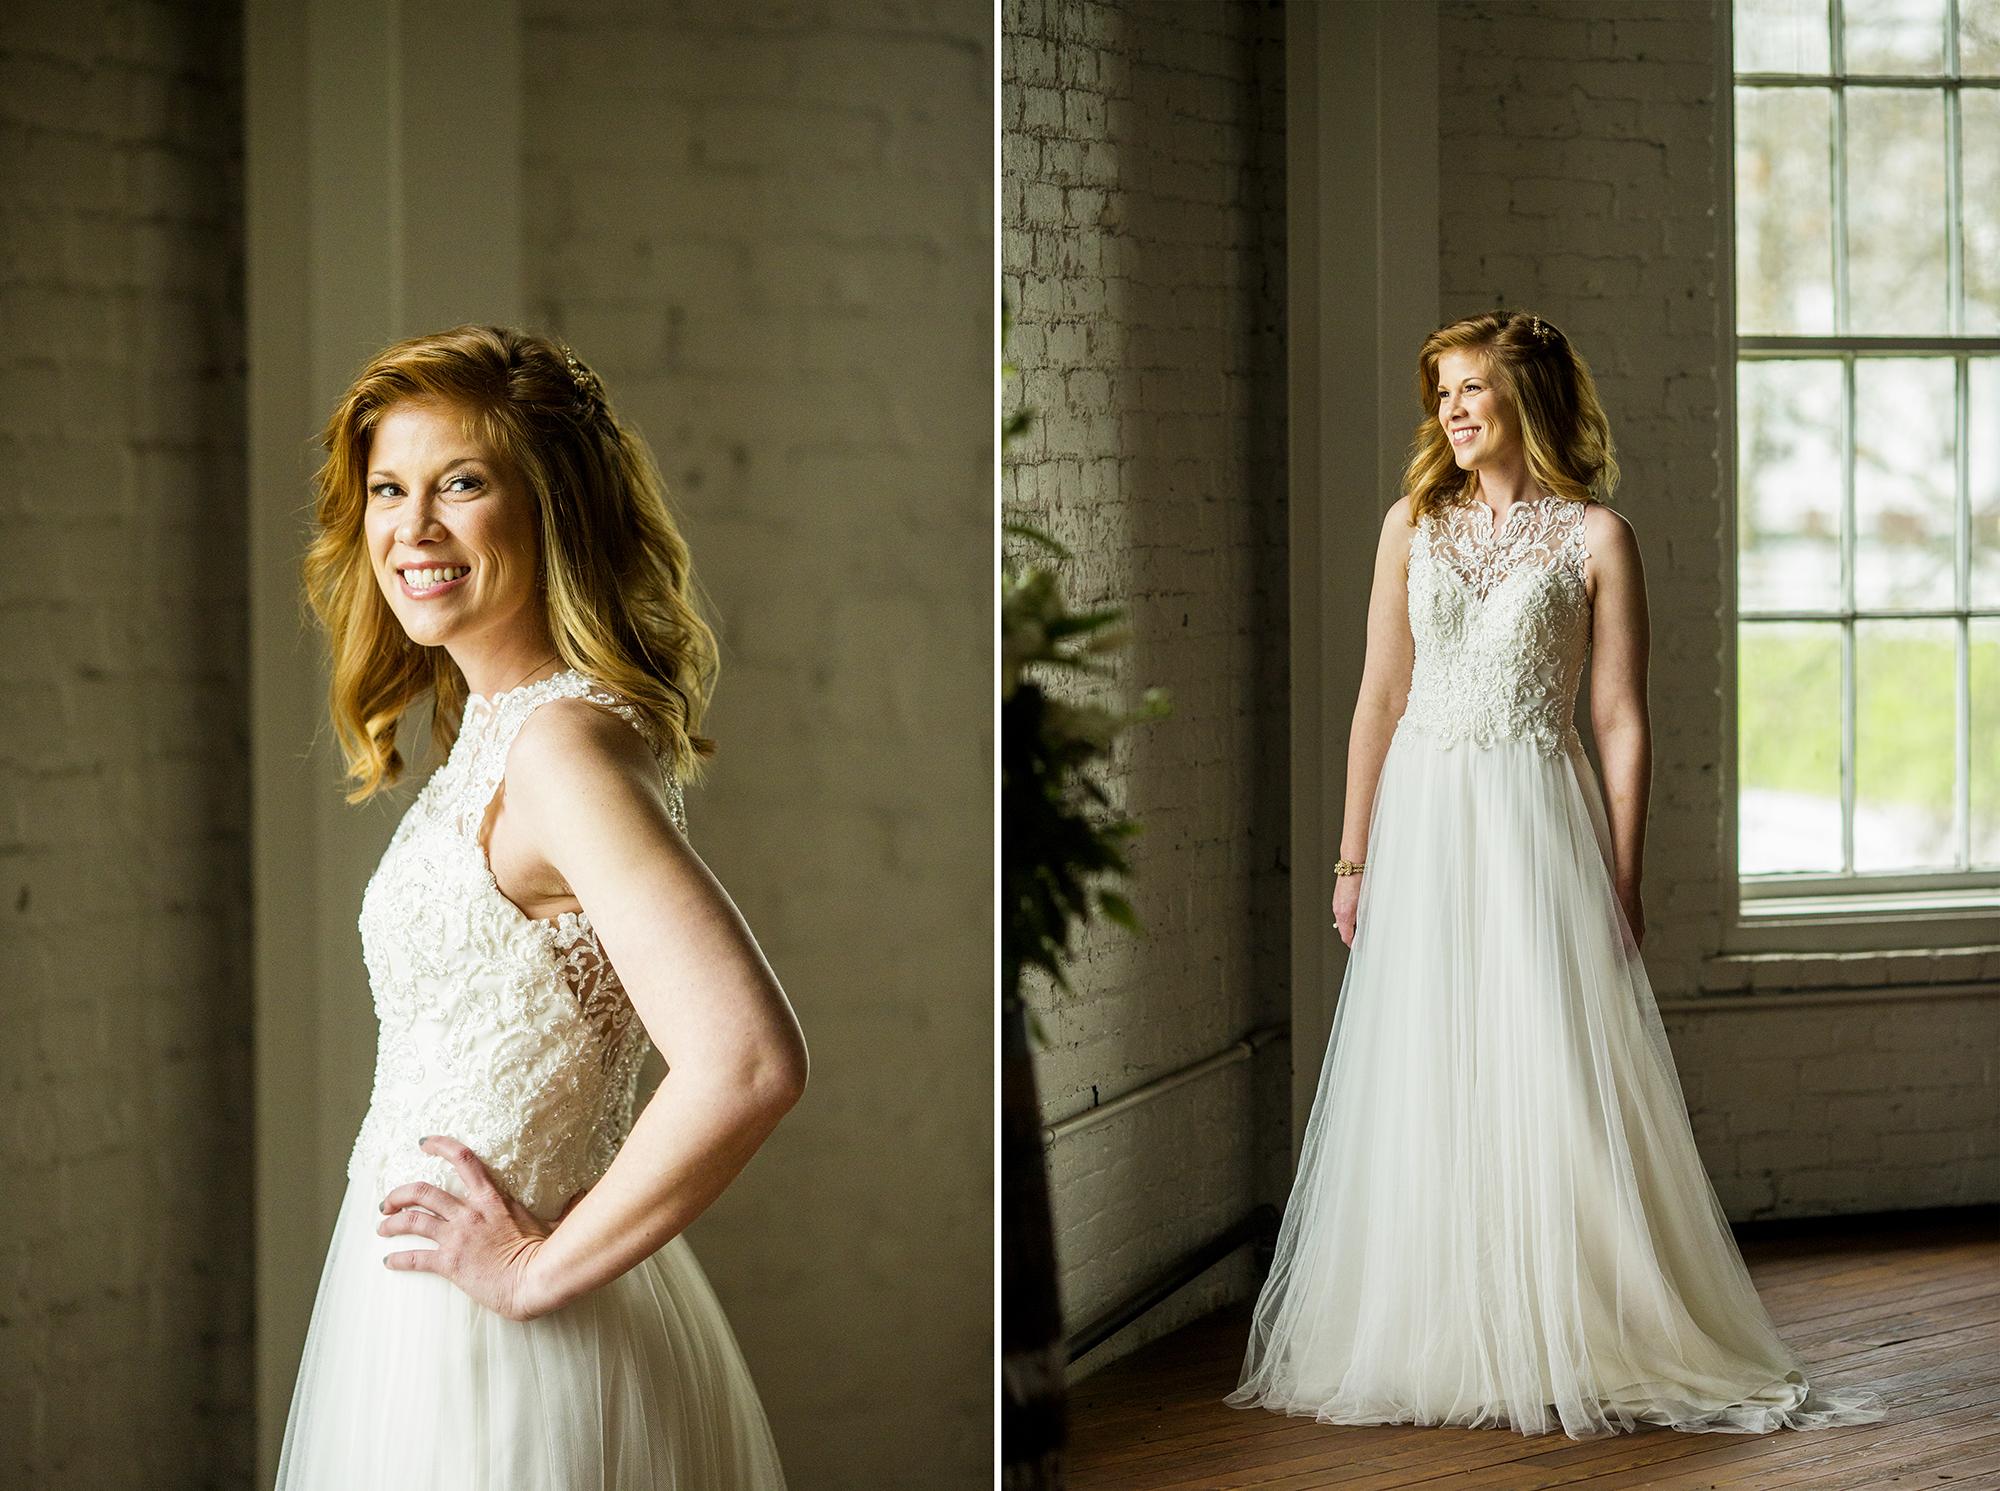 Seriously_Sabrina_Photography_Lexington_Kentucky_Red_Barn_Red_Mile_Wedding_Detoma31.jpg